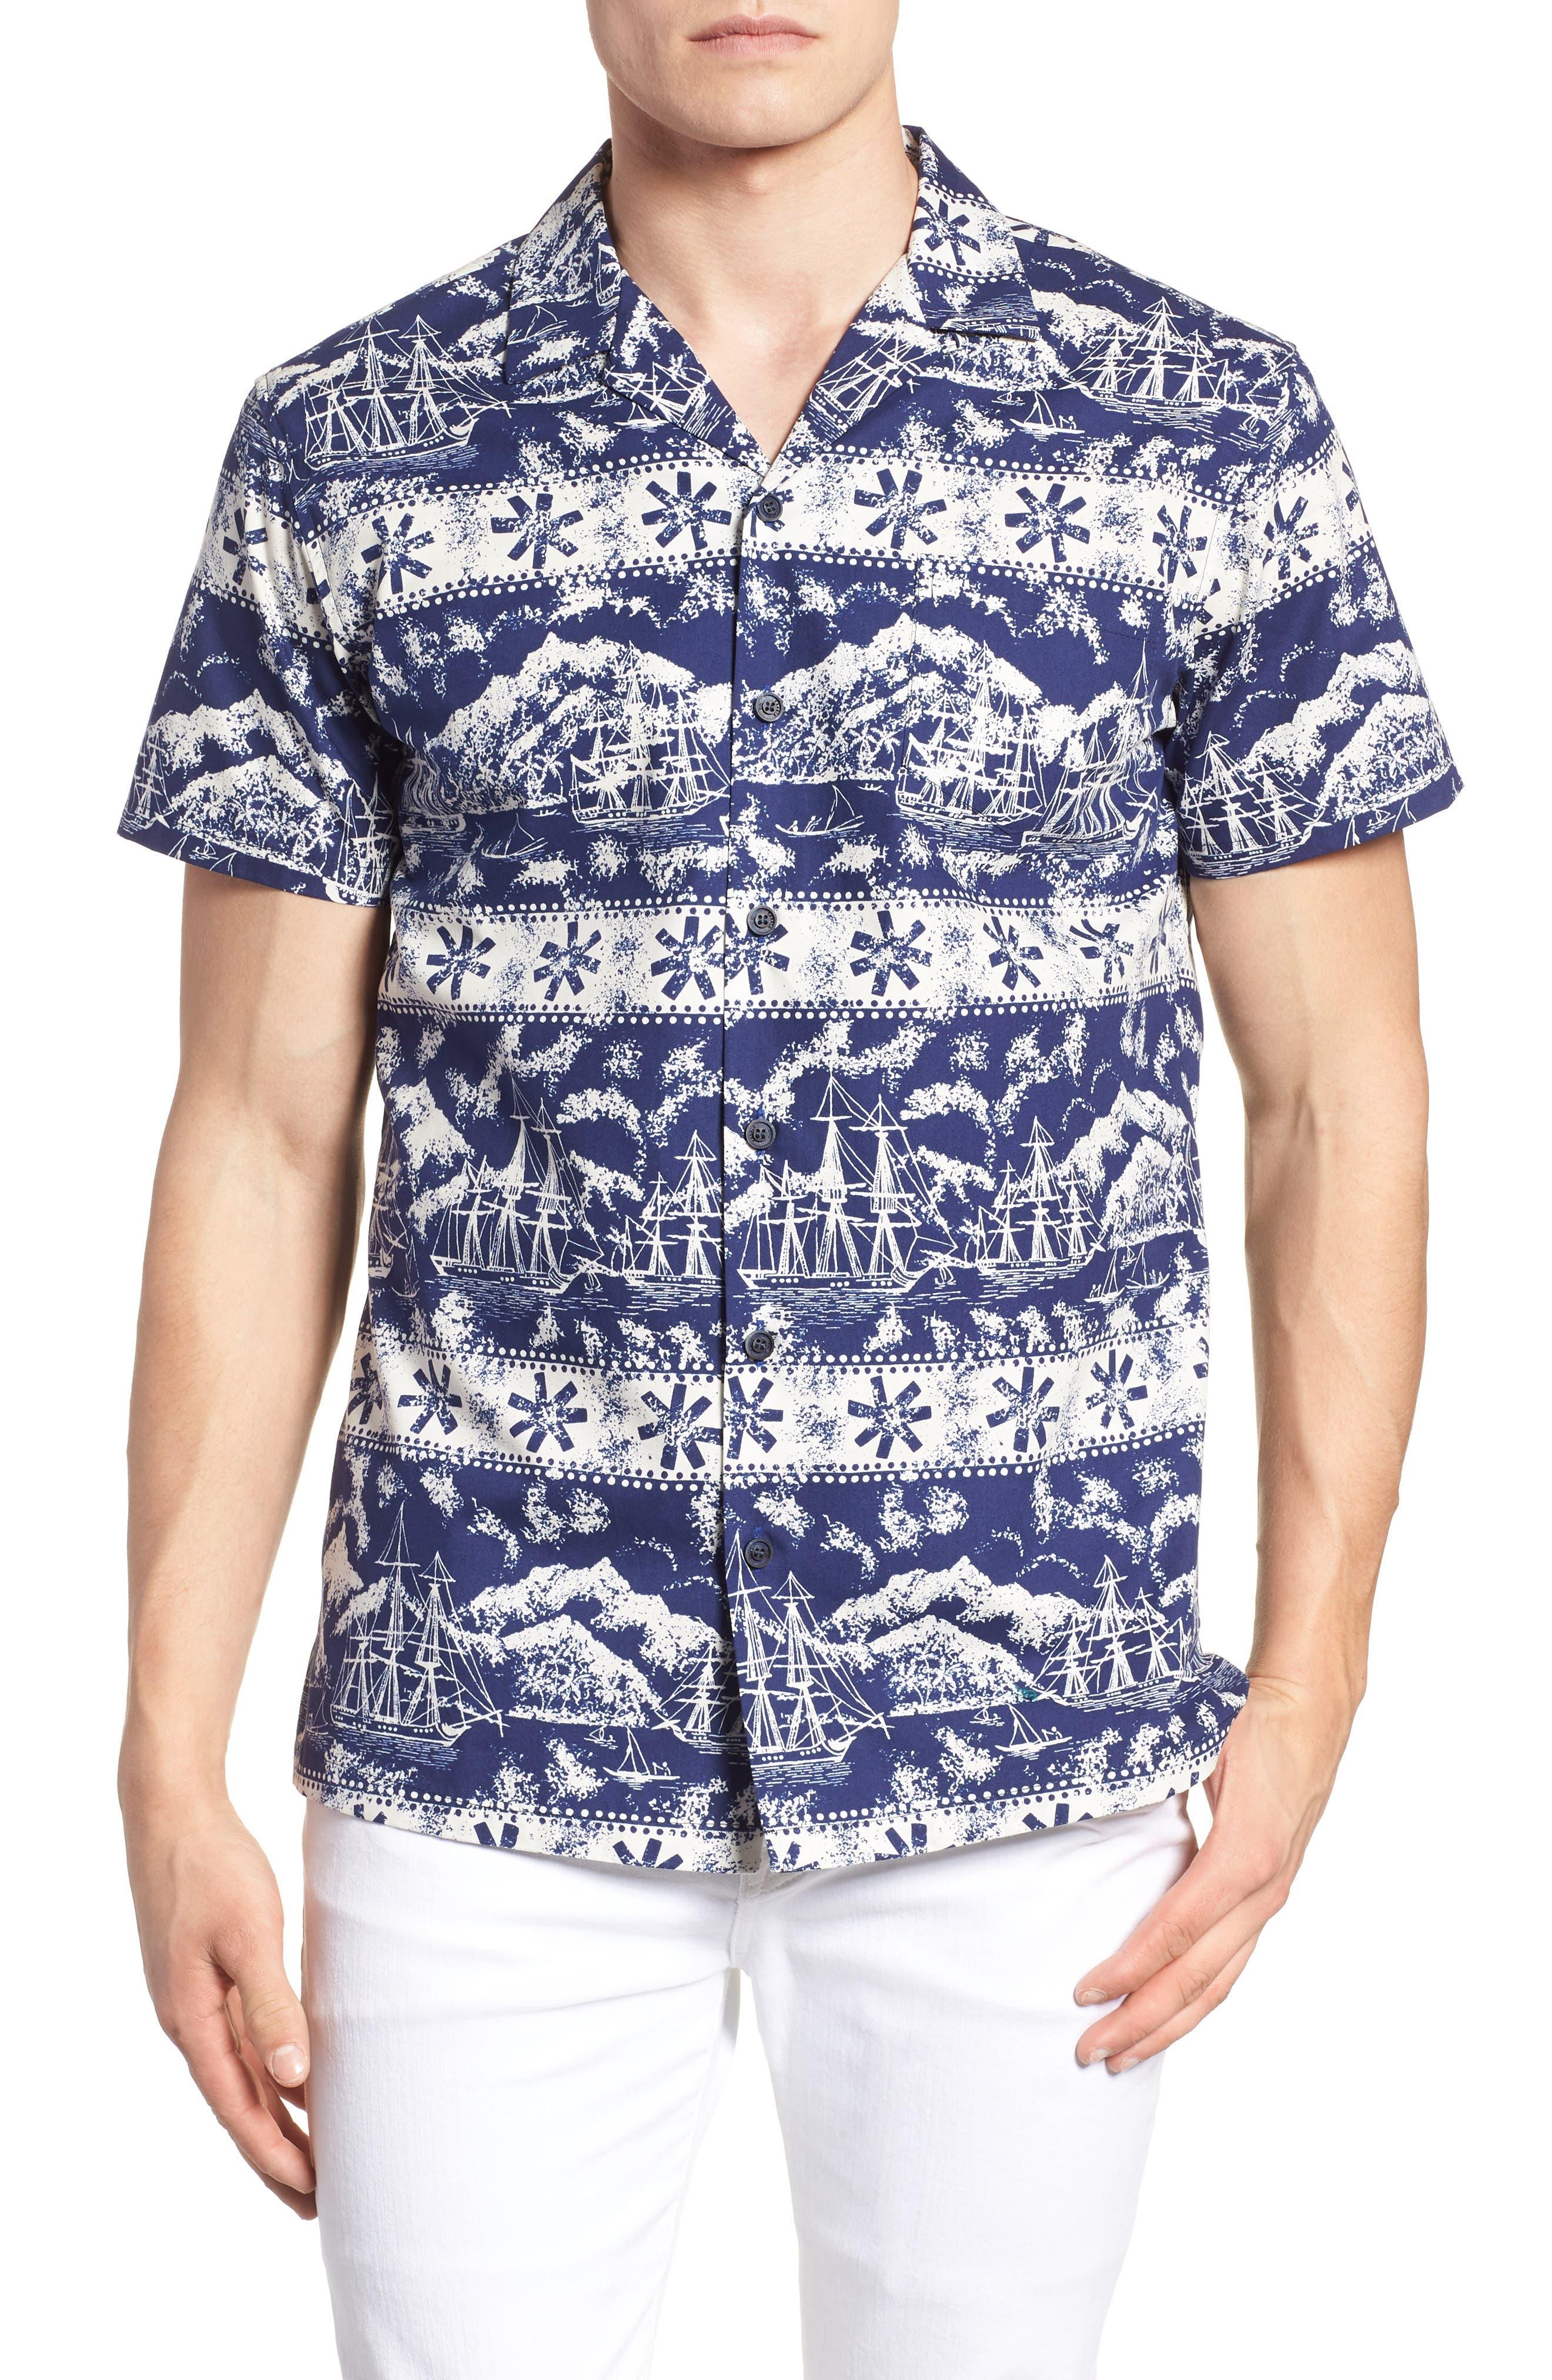 Safe Harbor Slim Fit Camp Shirt,                             Main thumbnail 1, color,                             415